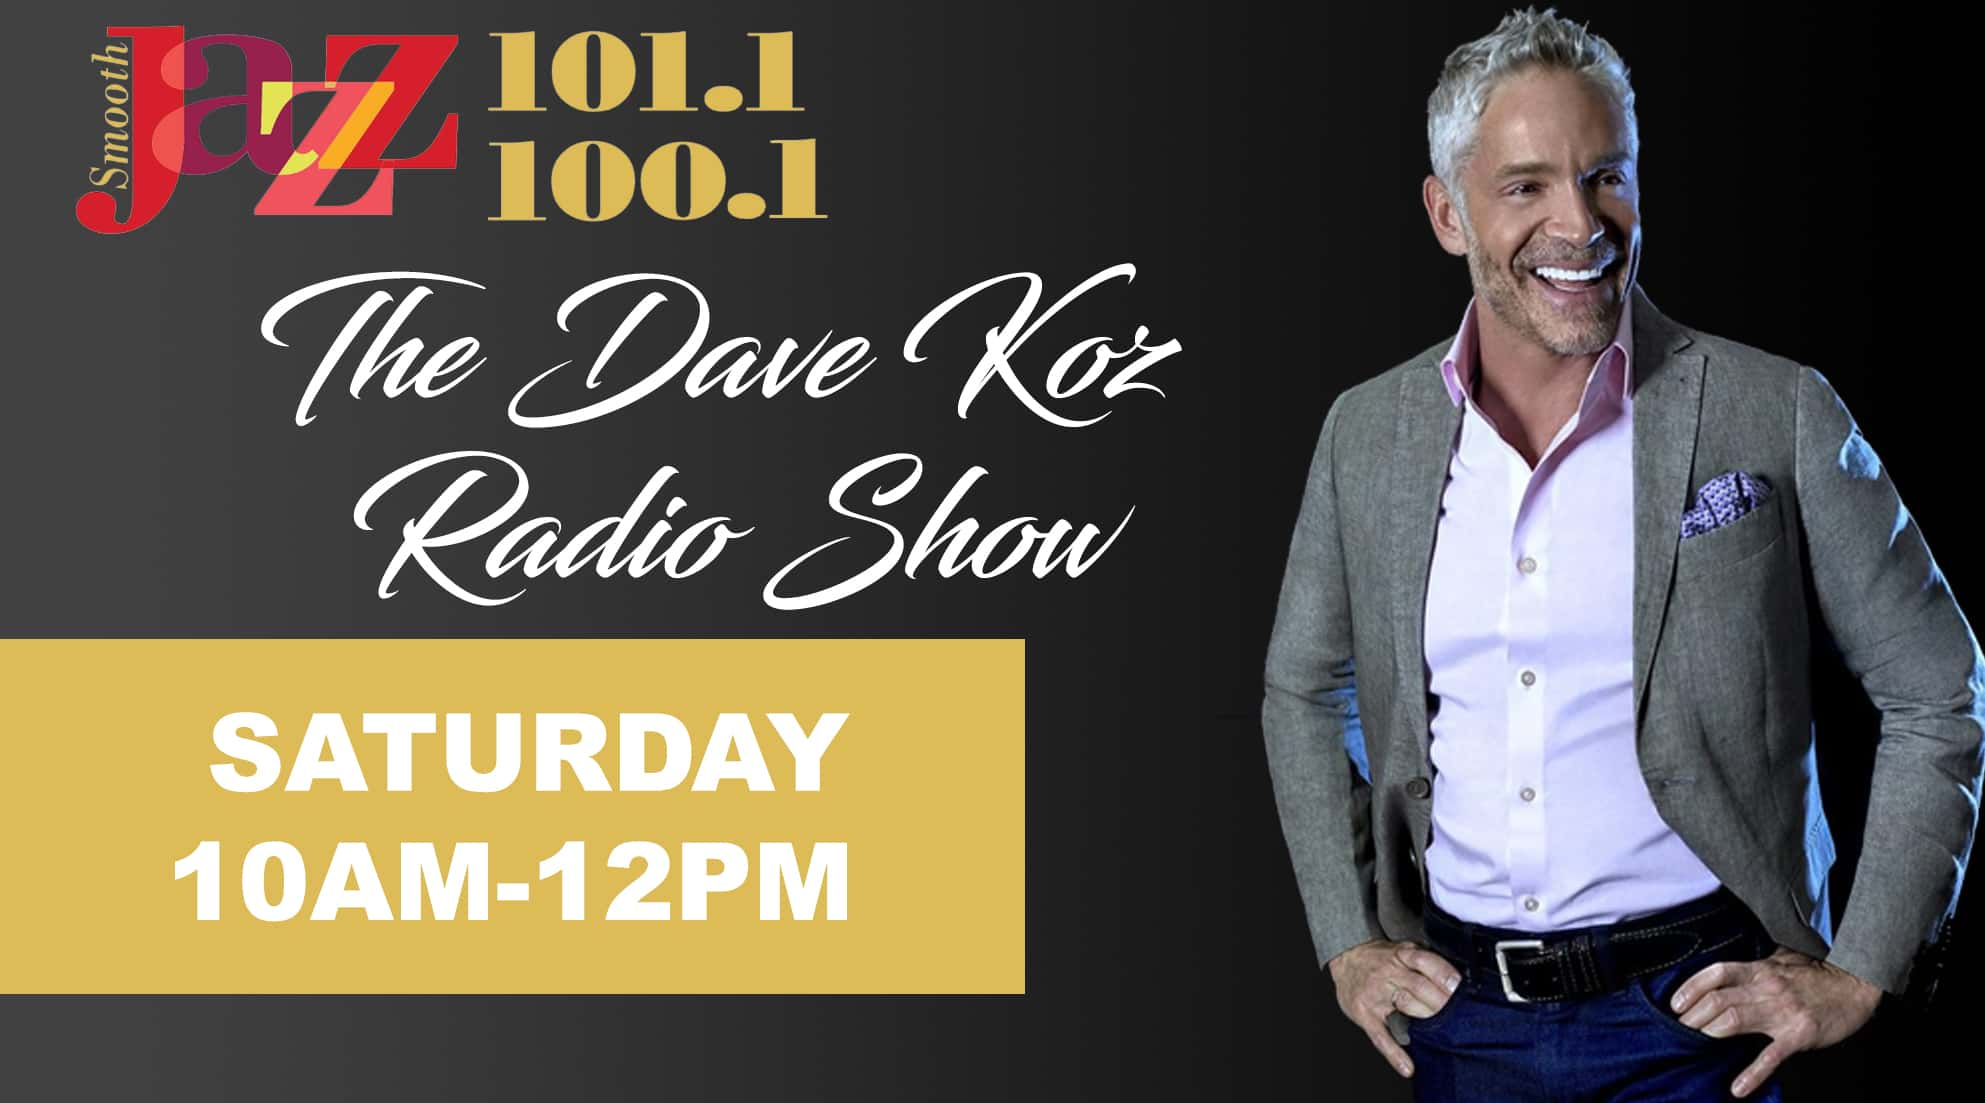 Dave-Koz3